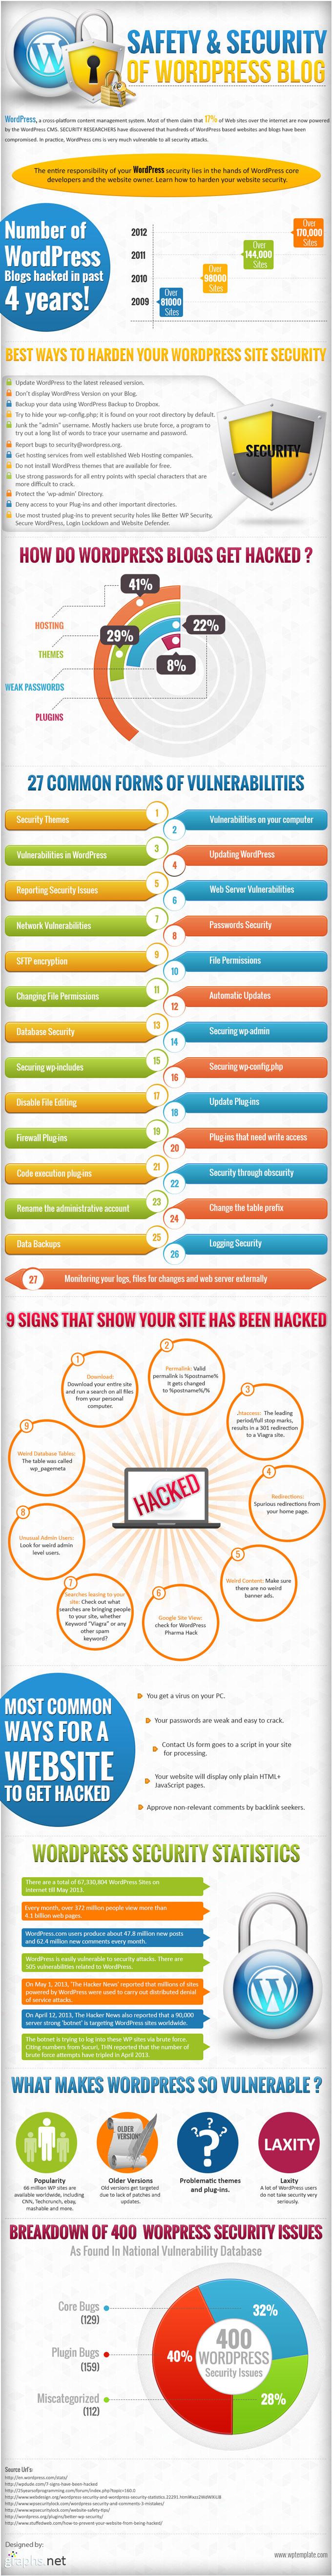 Wordpress Security Threats-Infographic